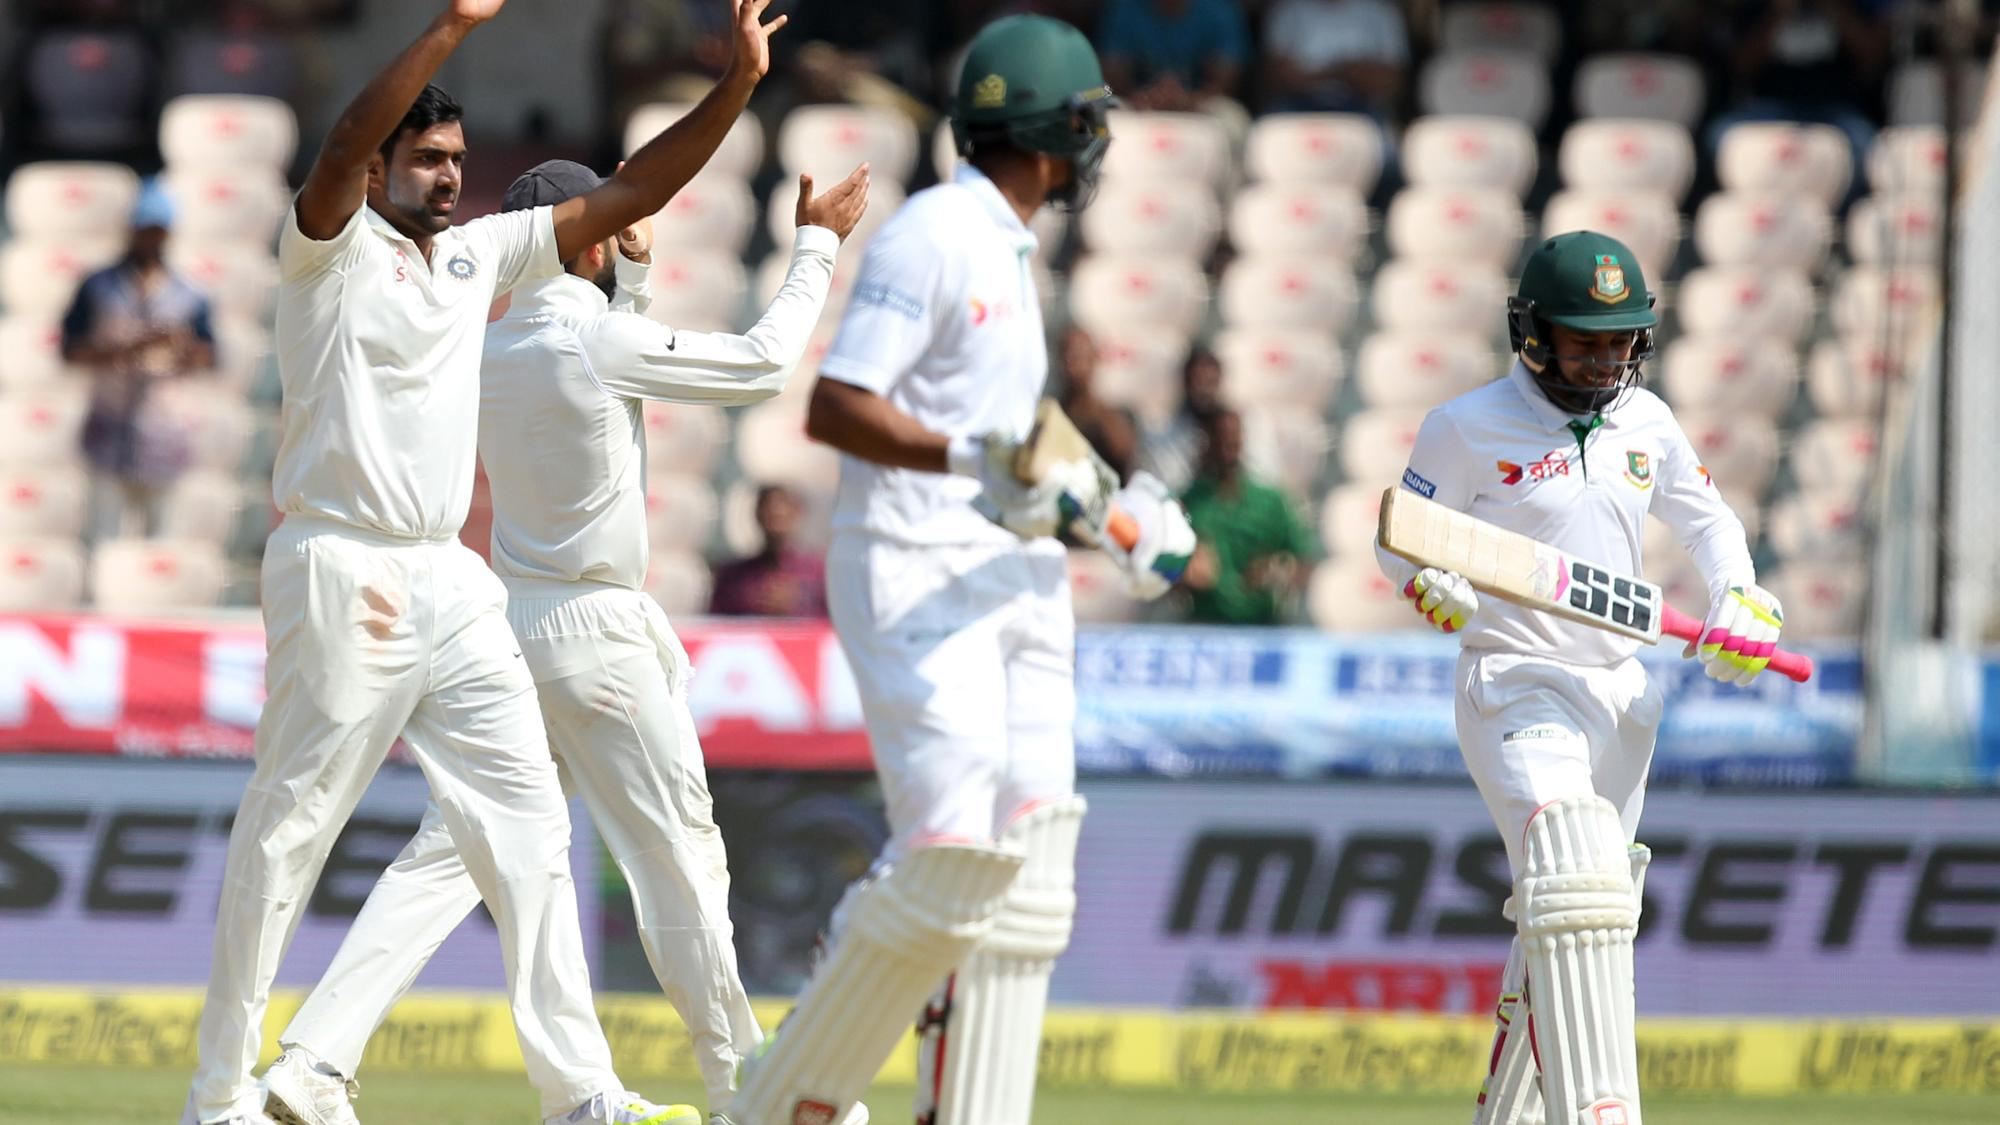 Ravichandran_Ashwin_celebrates_wicket_of_Mushfiqur_Rahim